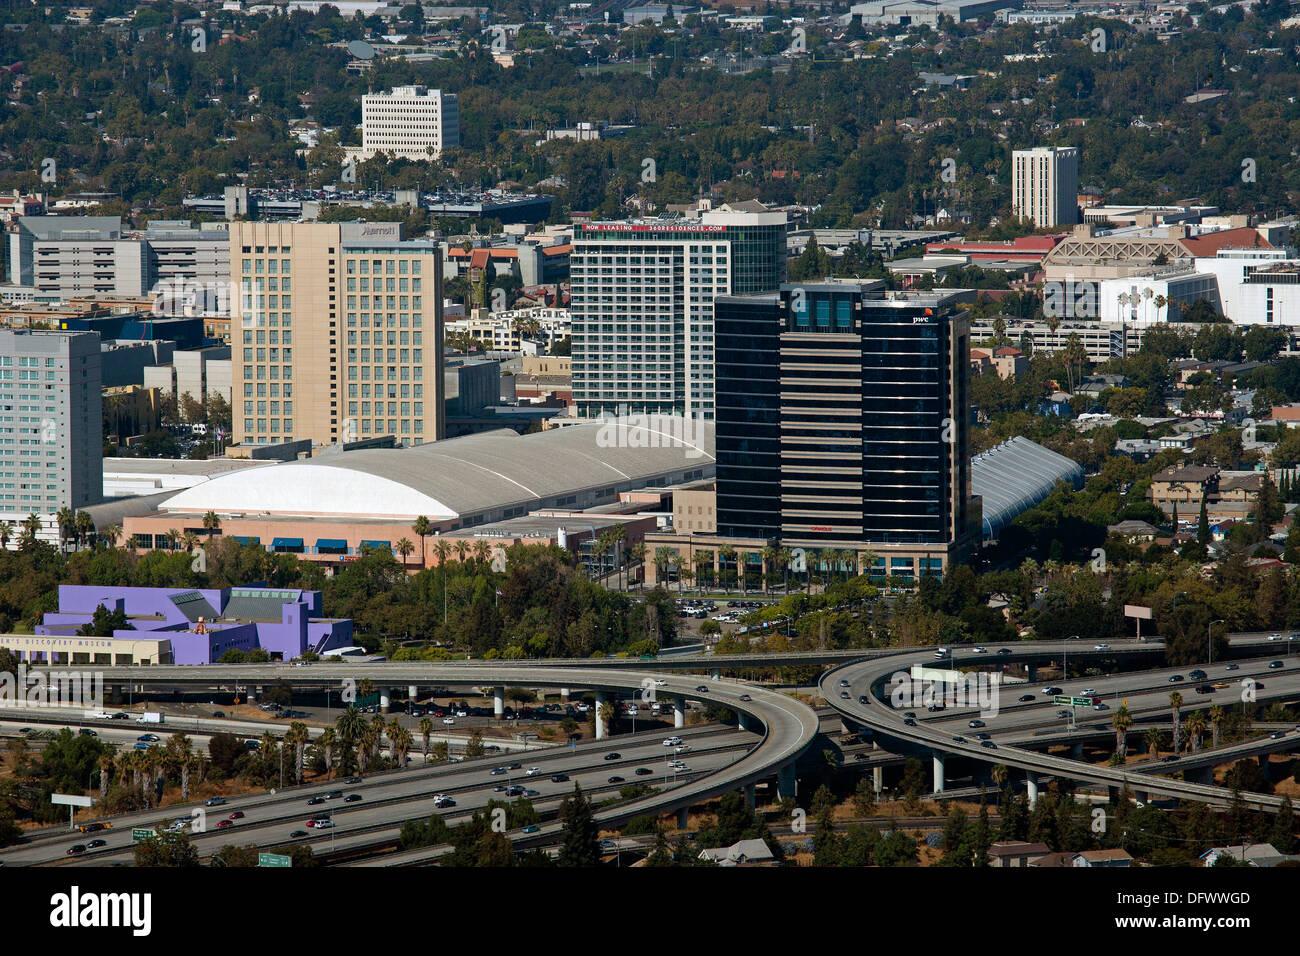 Photographie aérienne dowtown, San Jose Santa Clara, Californie Photo Stock